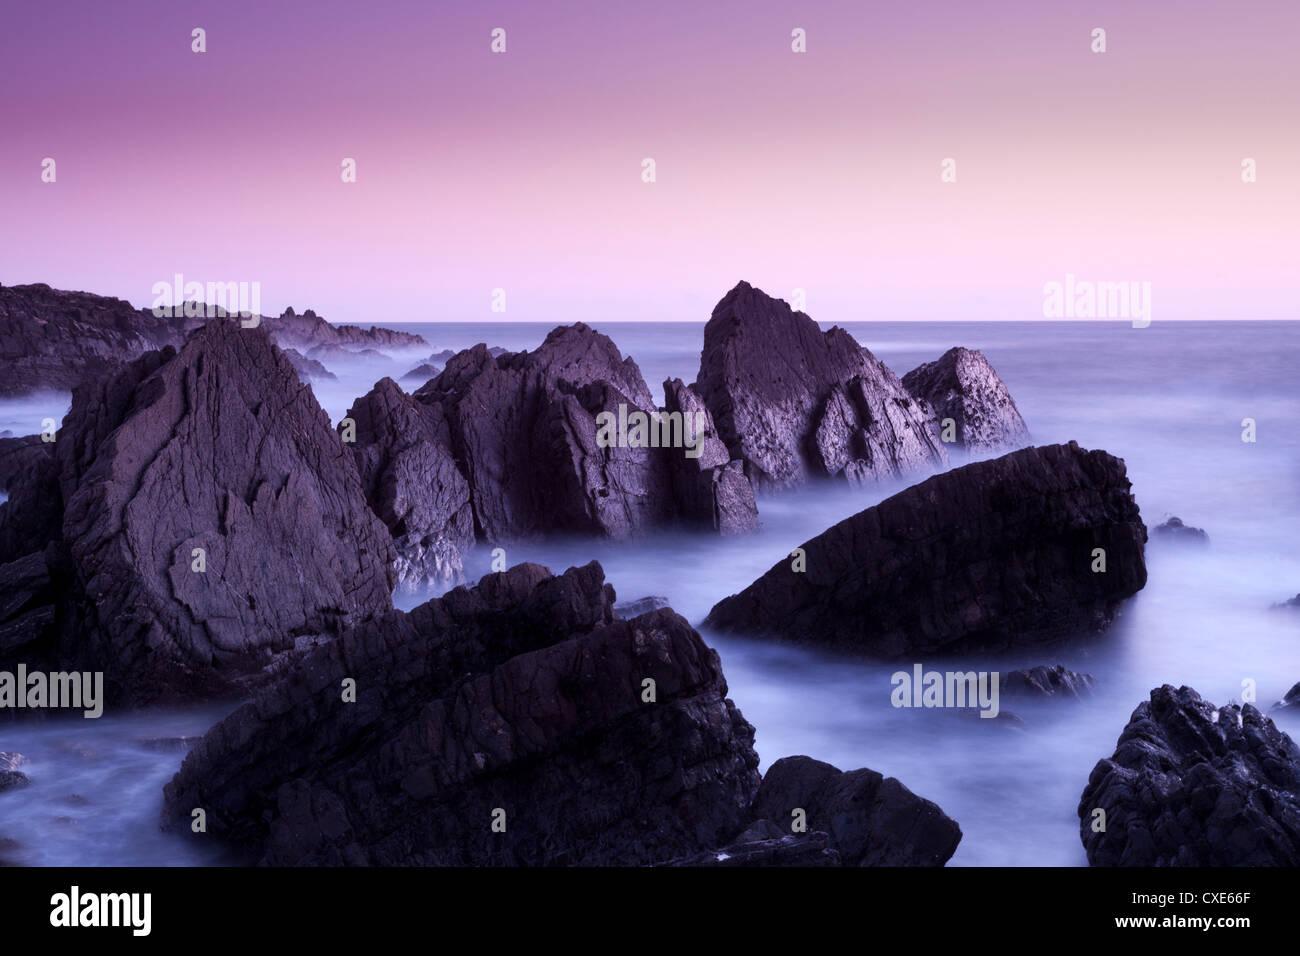 Waves moving over jagged rocks at Hartland Quay, Cornwall, England, United Kingdom, Europe - Stock Image